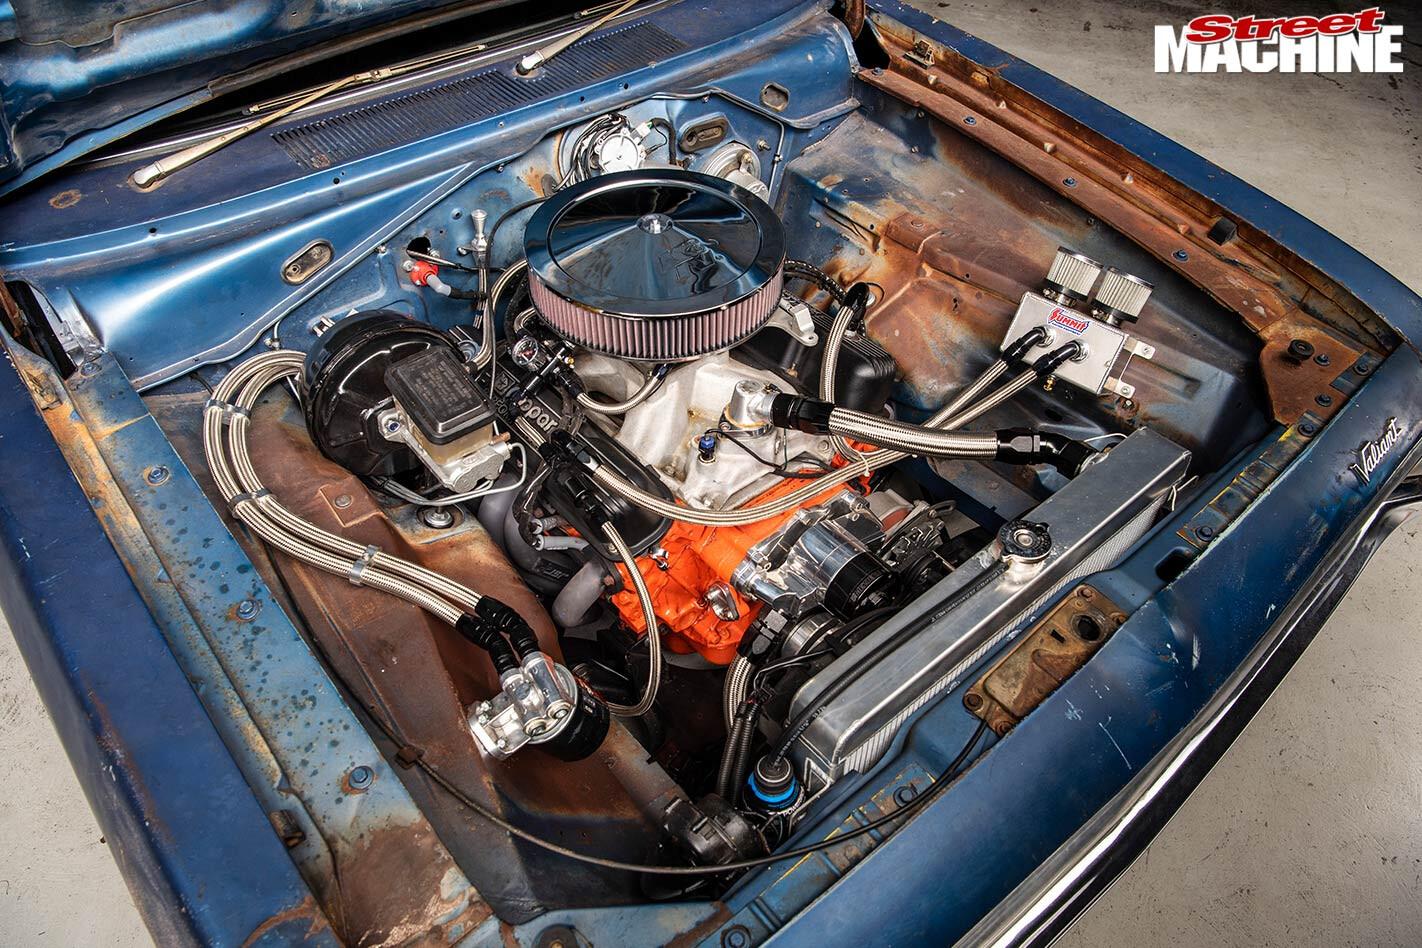 Chrysler VH Valiant engine bay